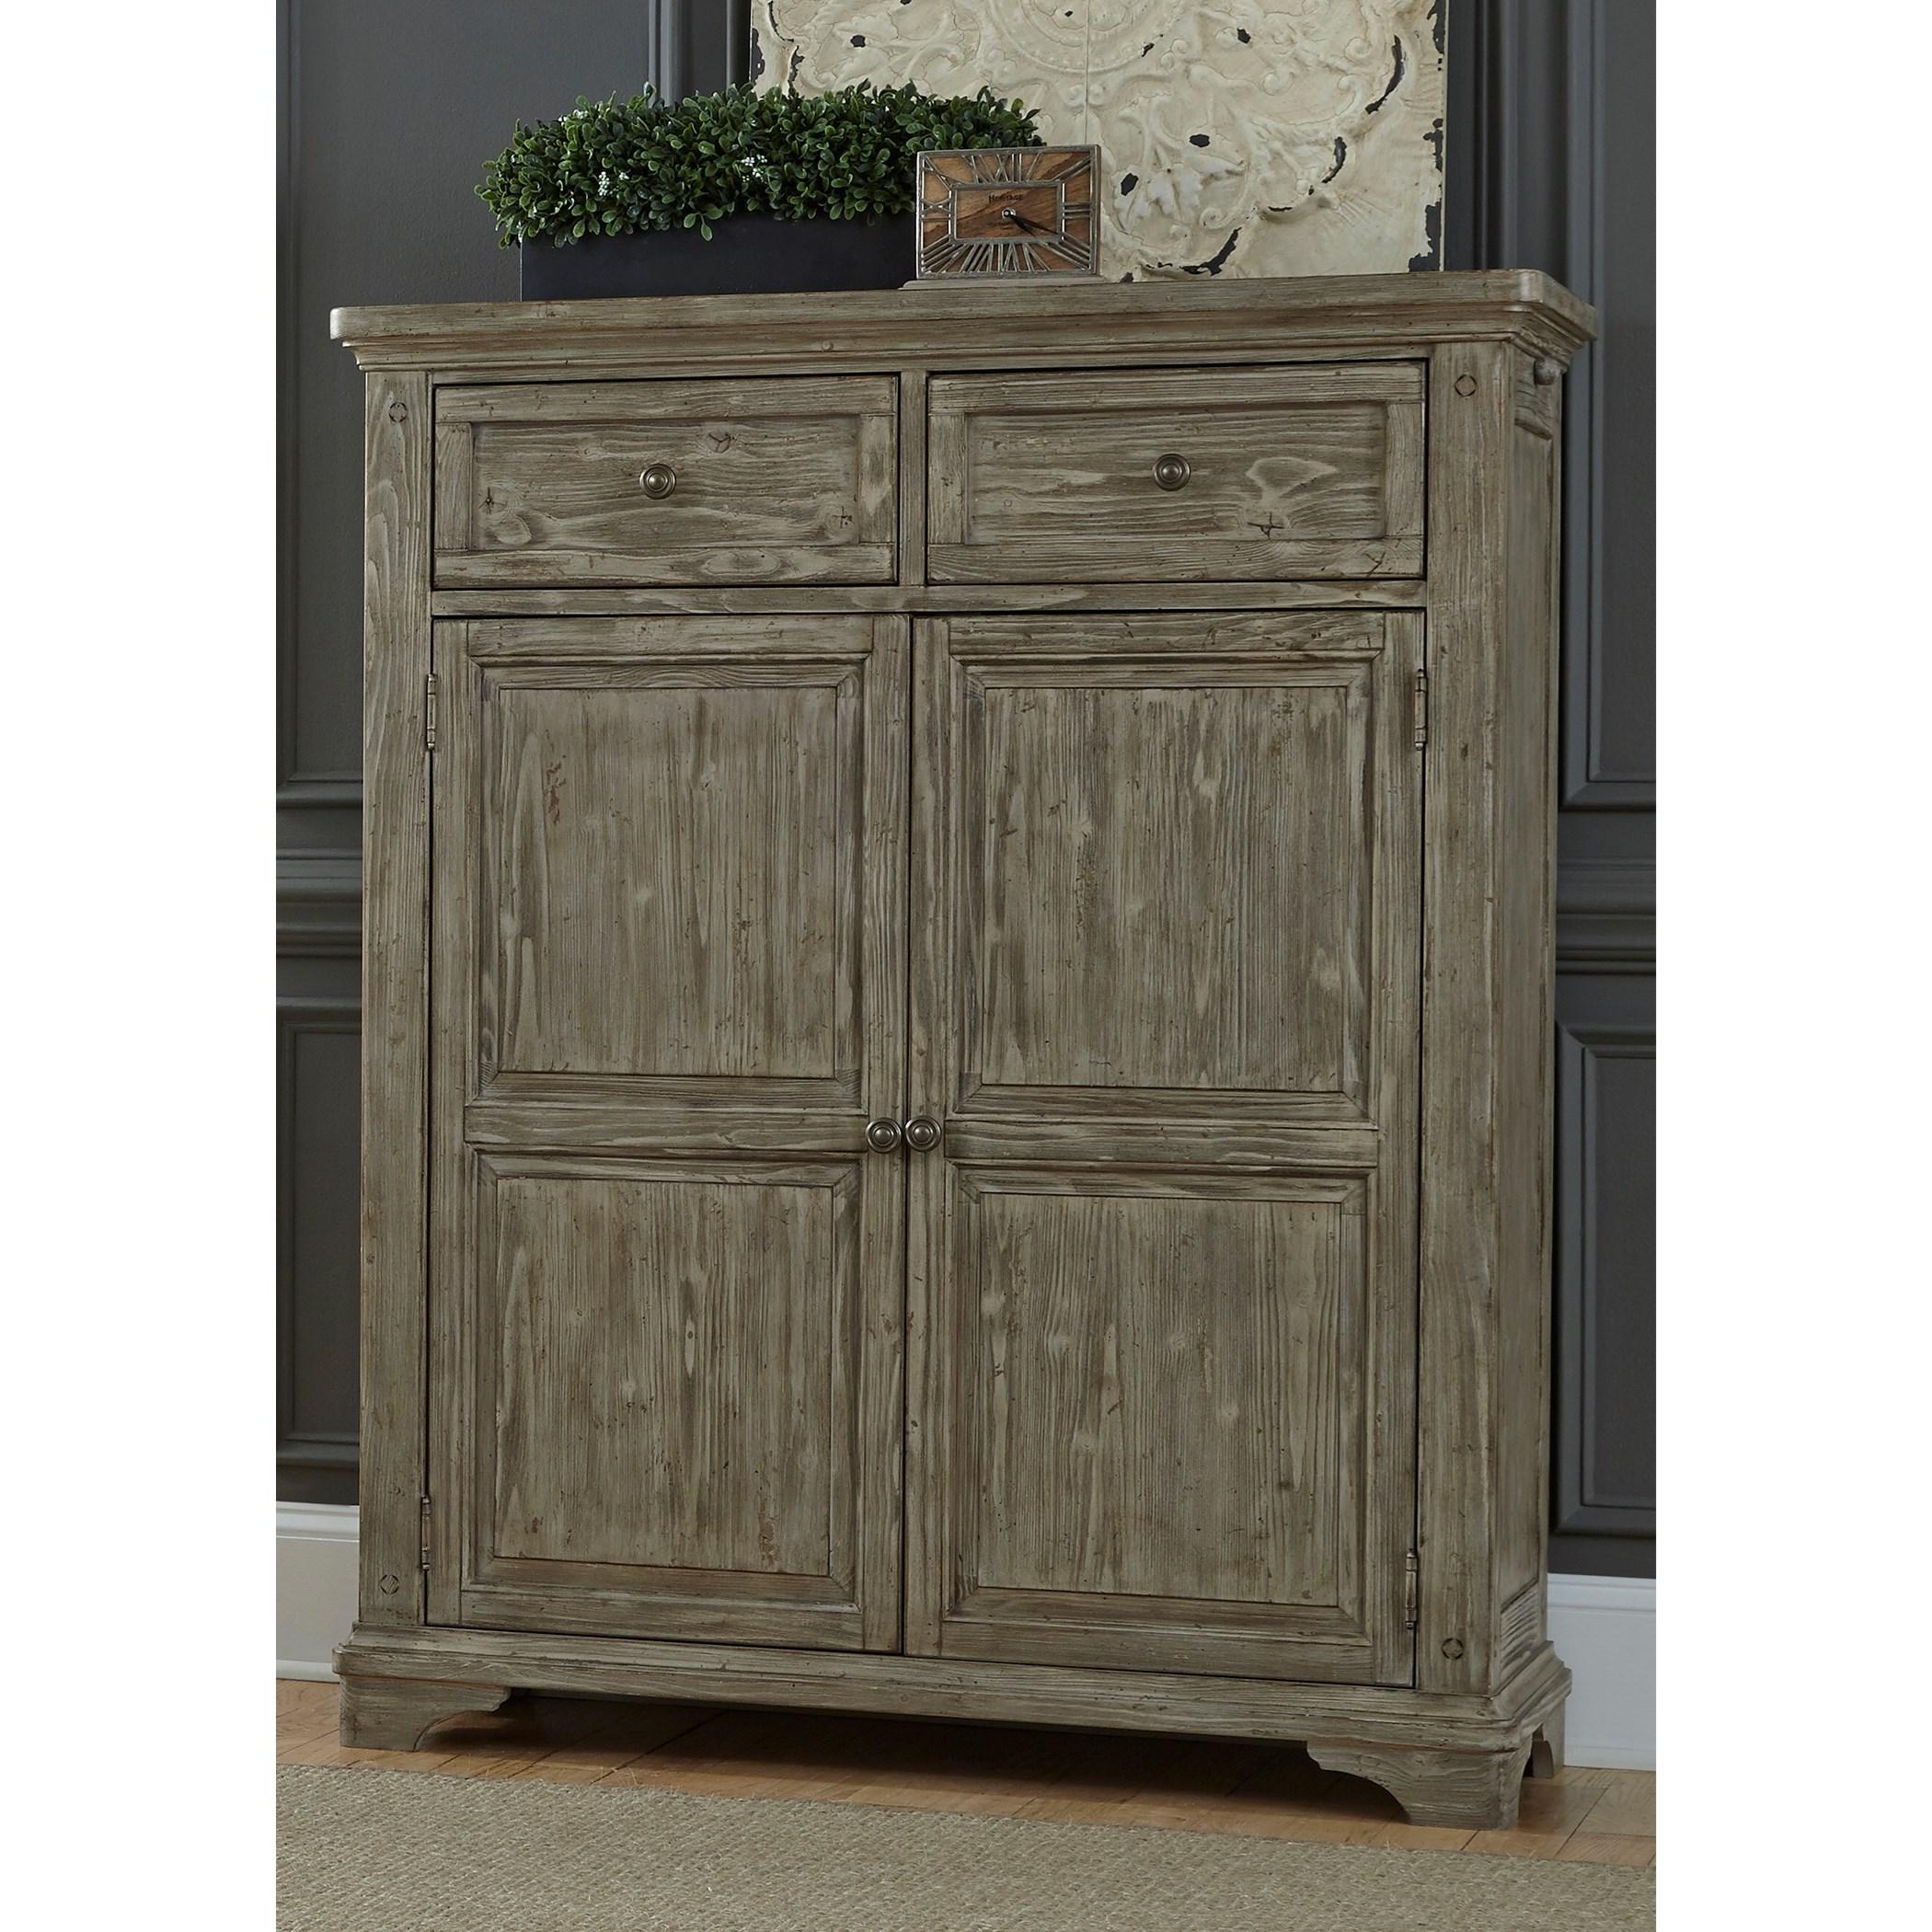 Highlands Door Chest by Liberty Furniture at Lapeer Furniture & Mattress Center